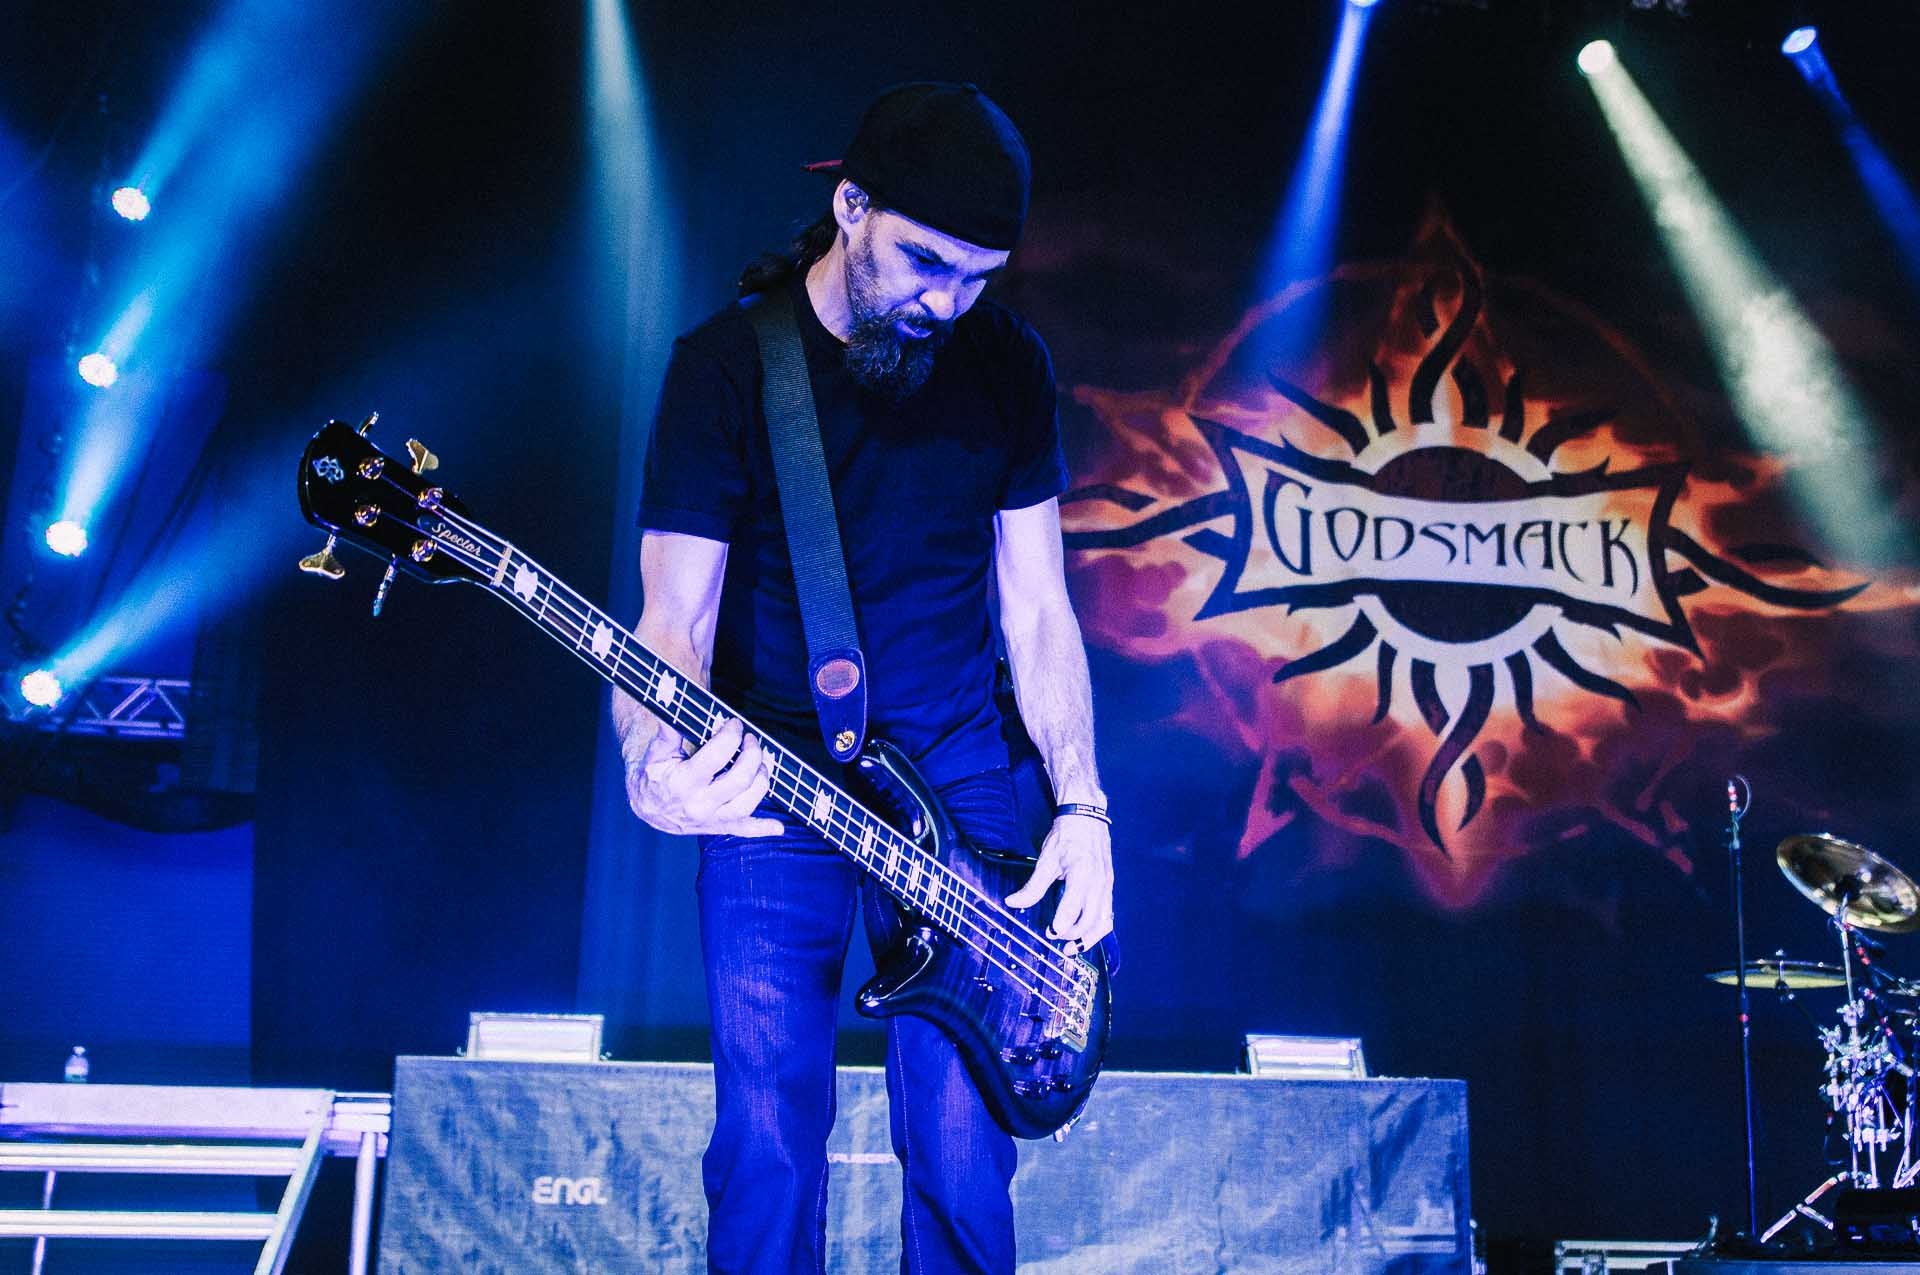 godsmack_x103_mayhem_festival_klipsch_music_center_indianapolis_080711-04